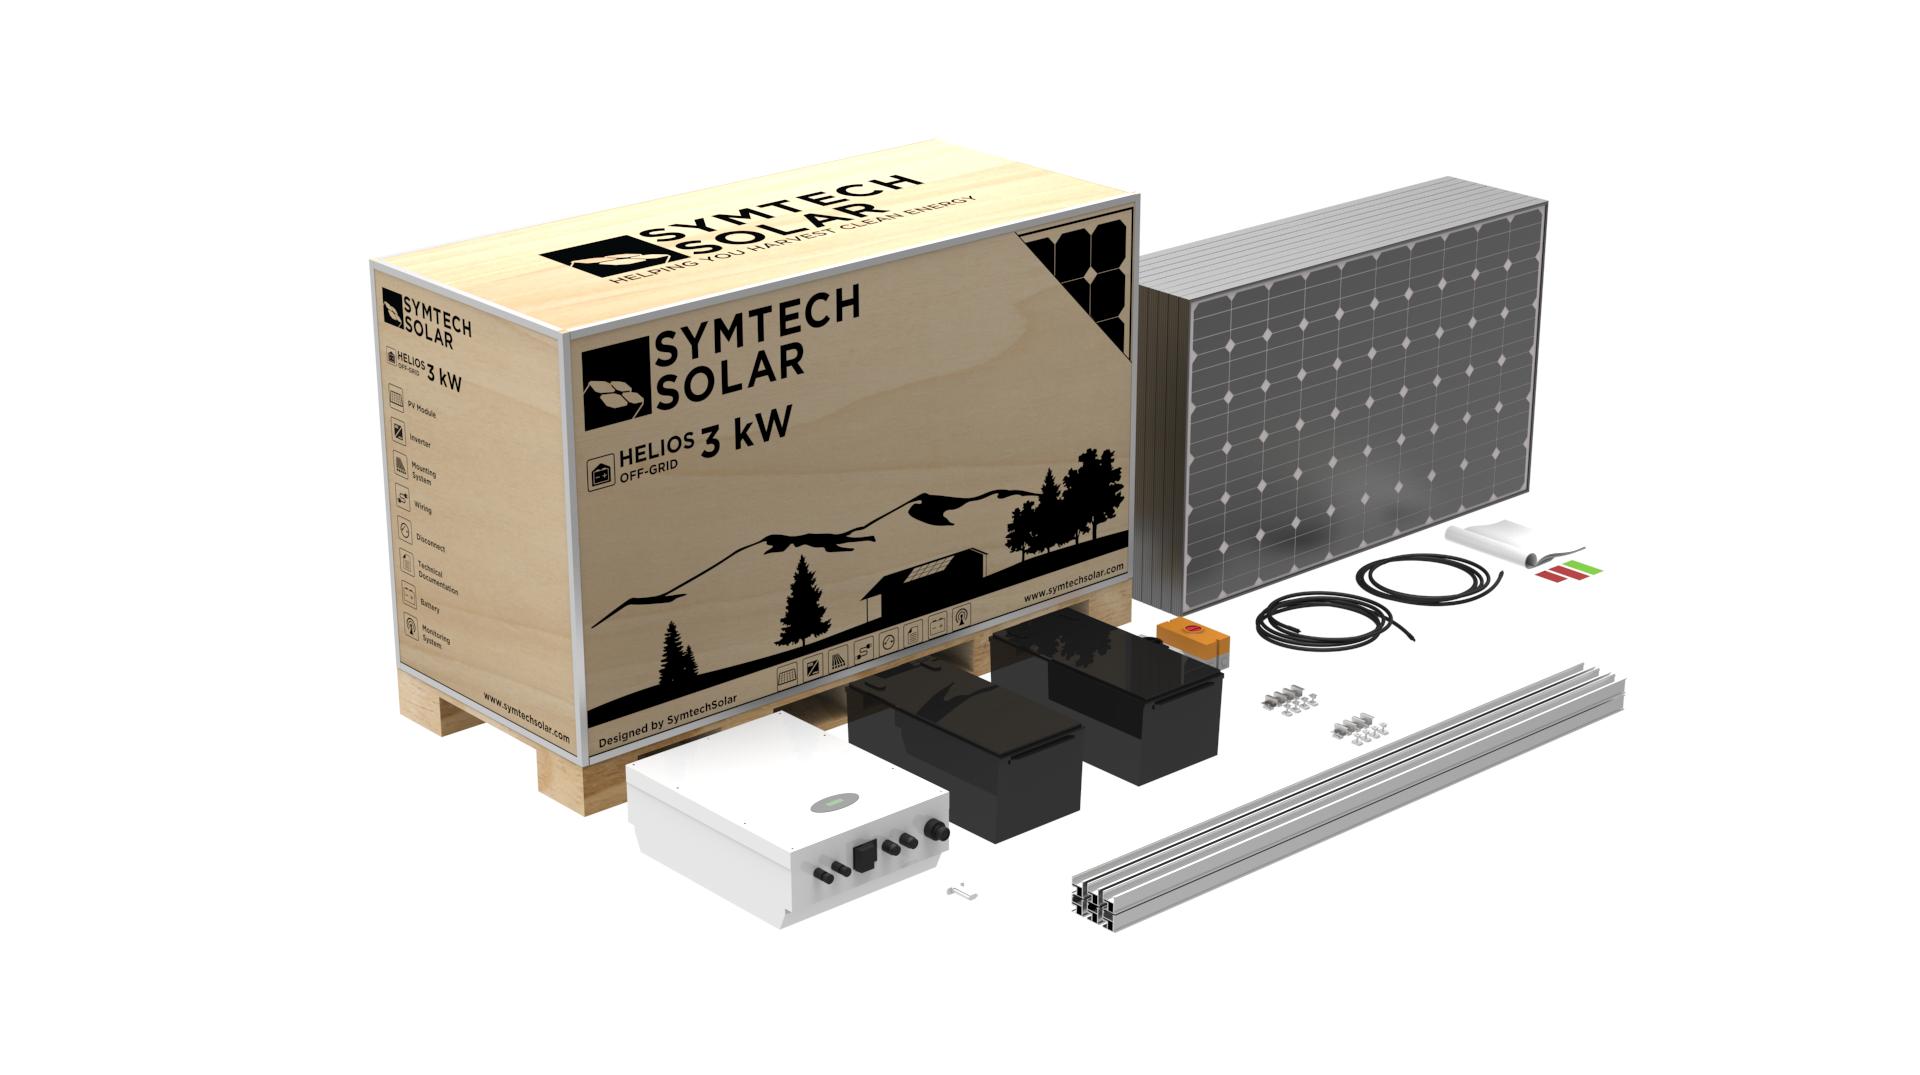 Symtech Solar - Helios Series Box - 3kW PV Kit